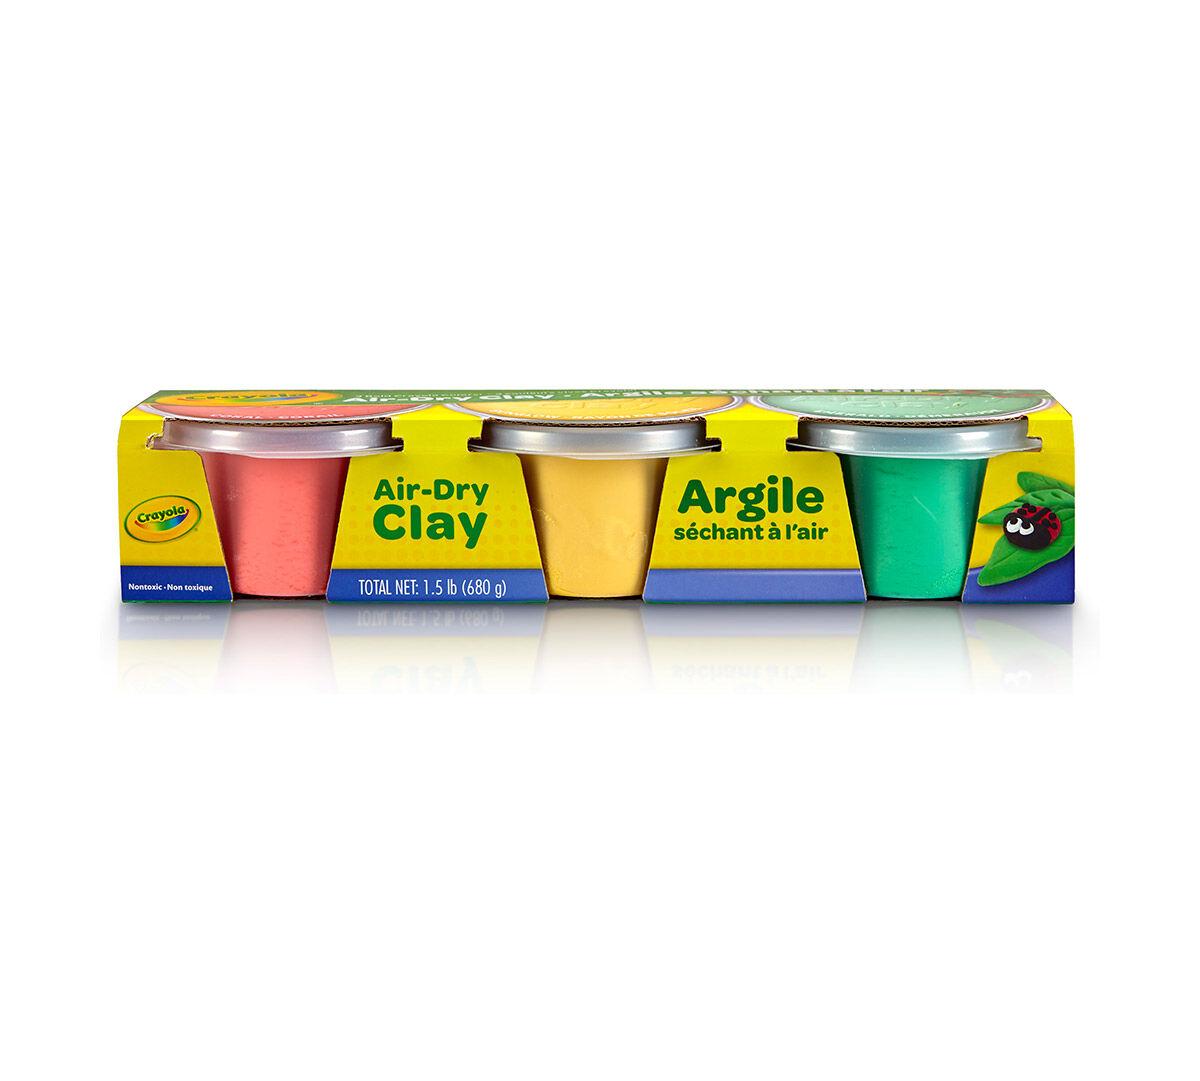 Air-Dry Clay Pastel Assortment - Crayola